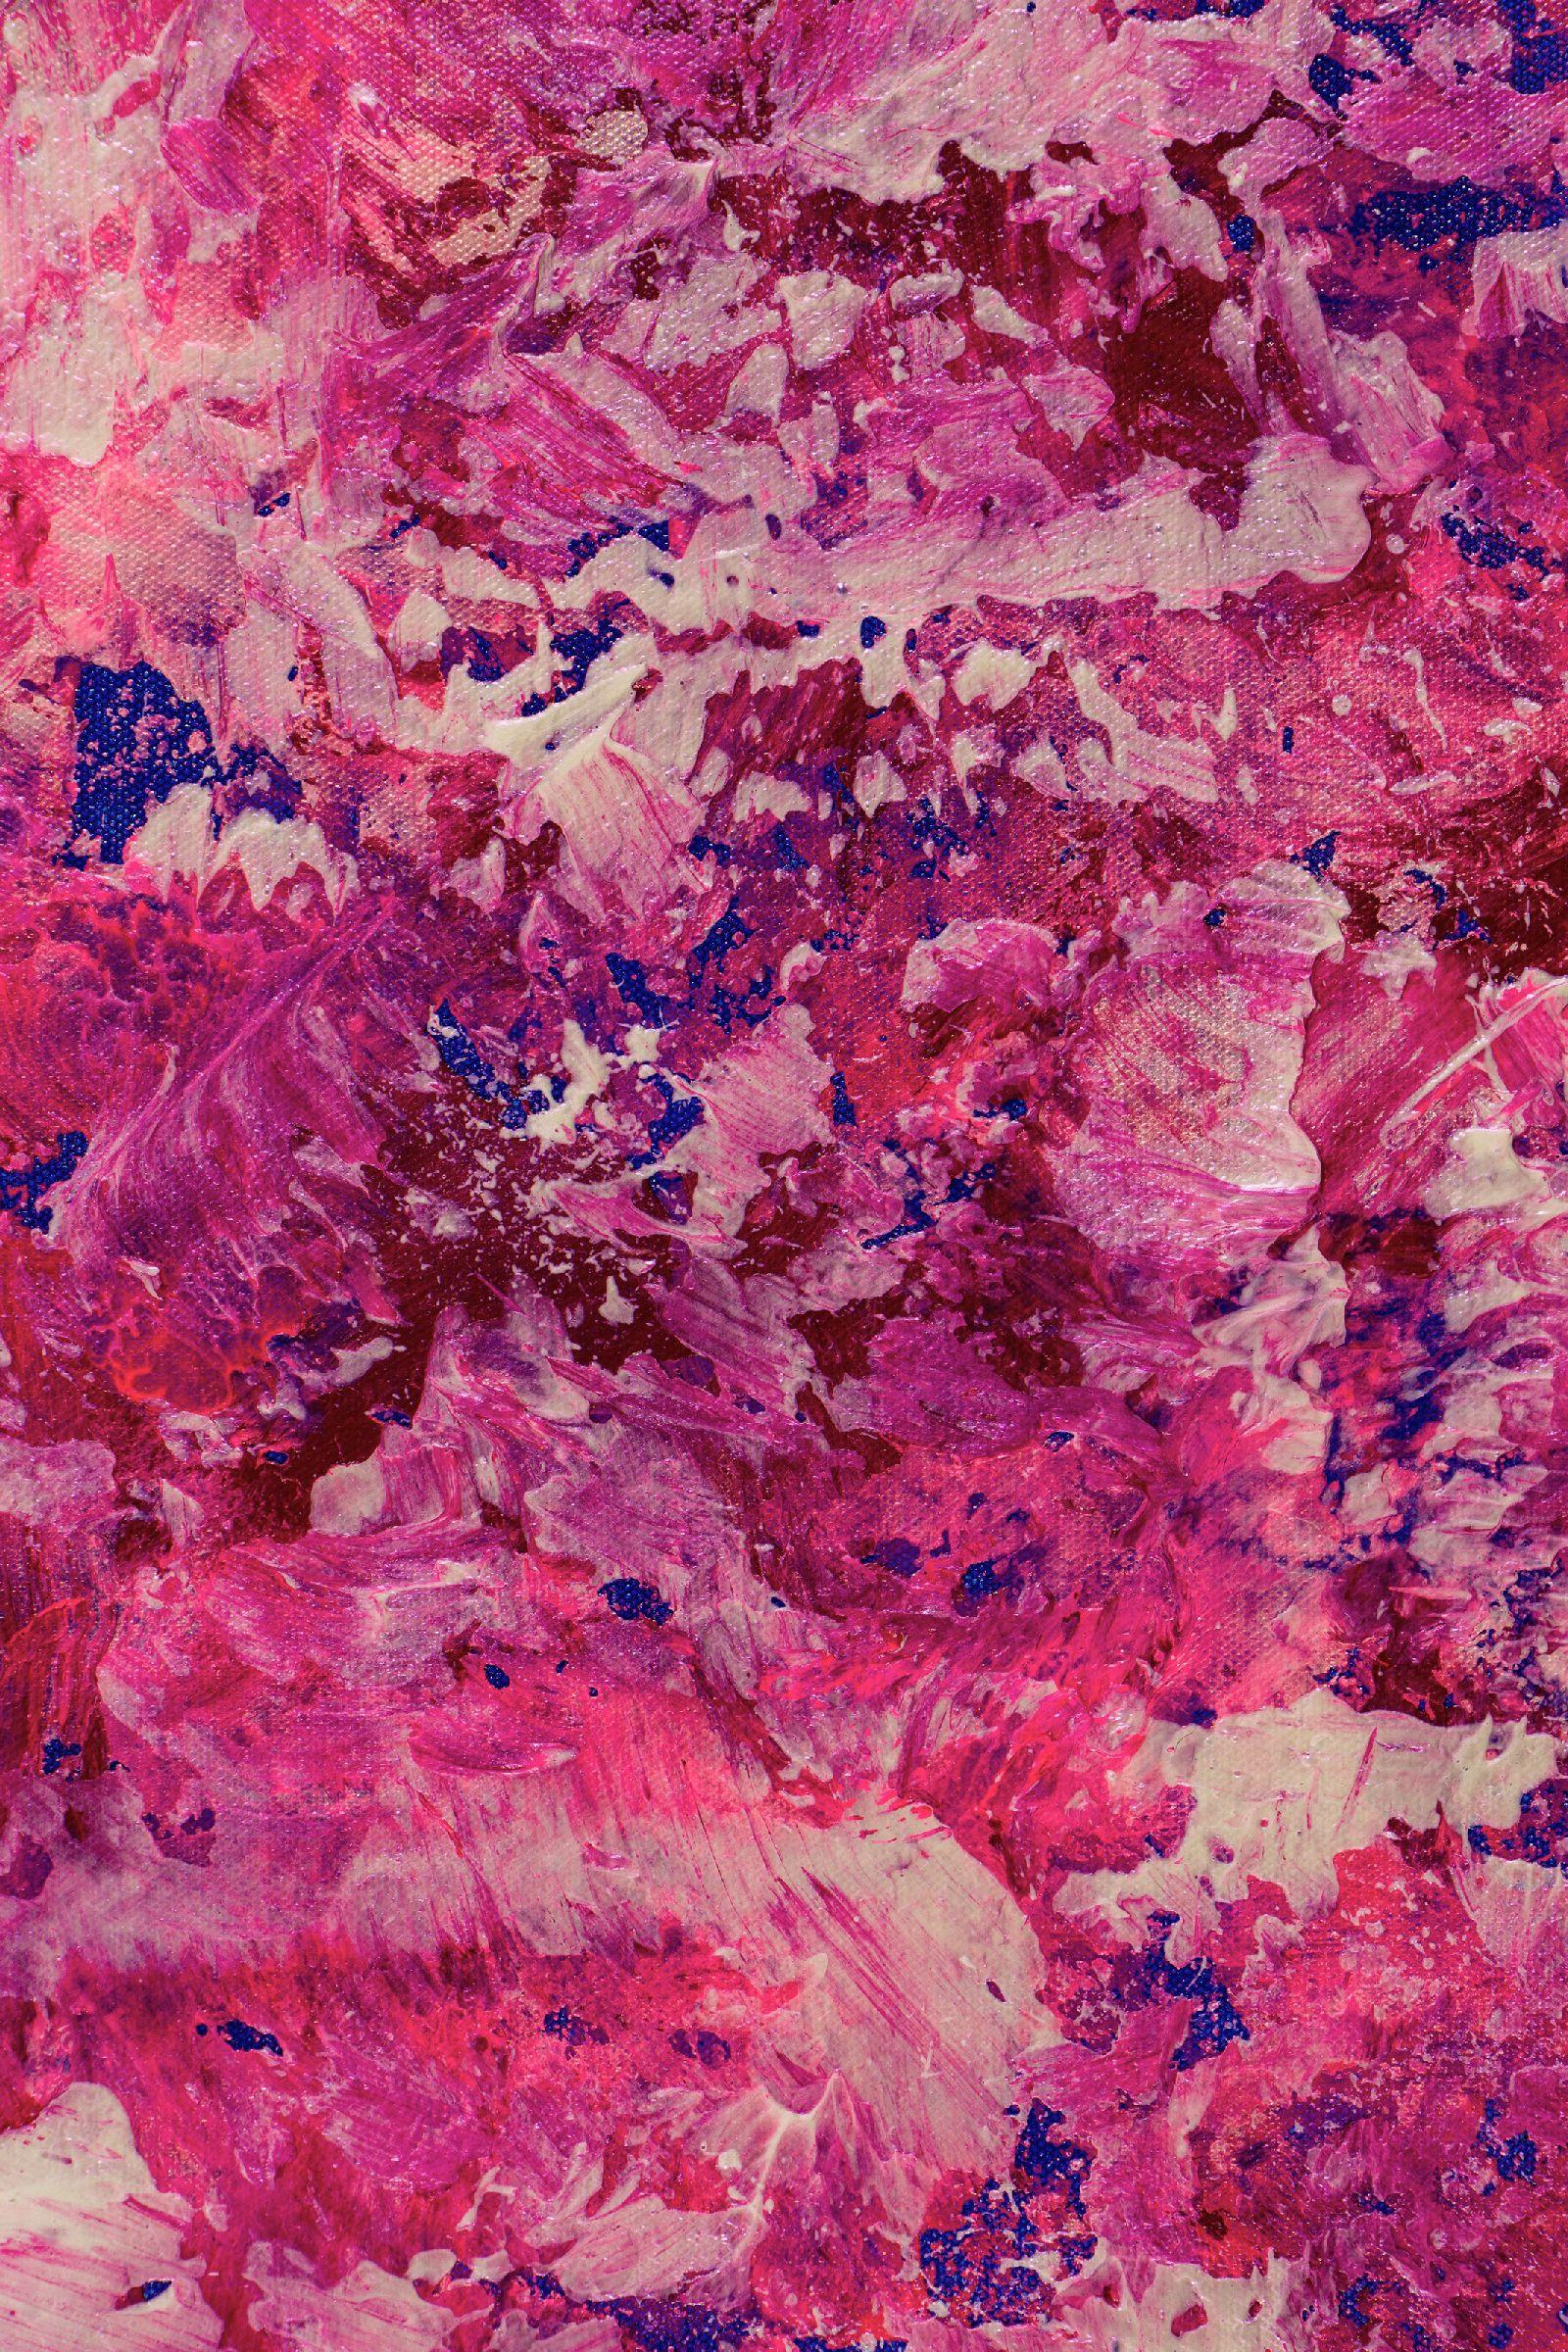 Detail - Pink Rush (Takeover) (2020) by Nestor Toro